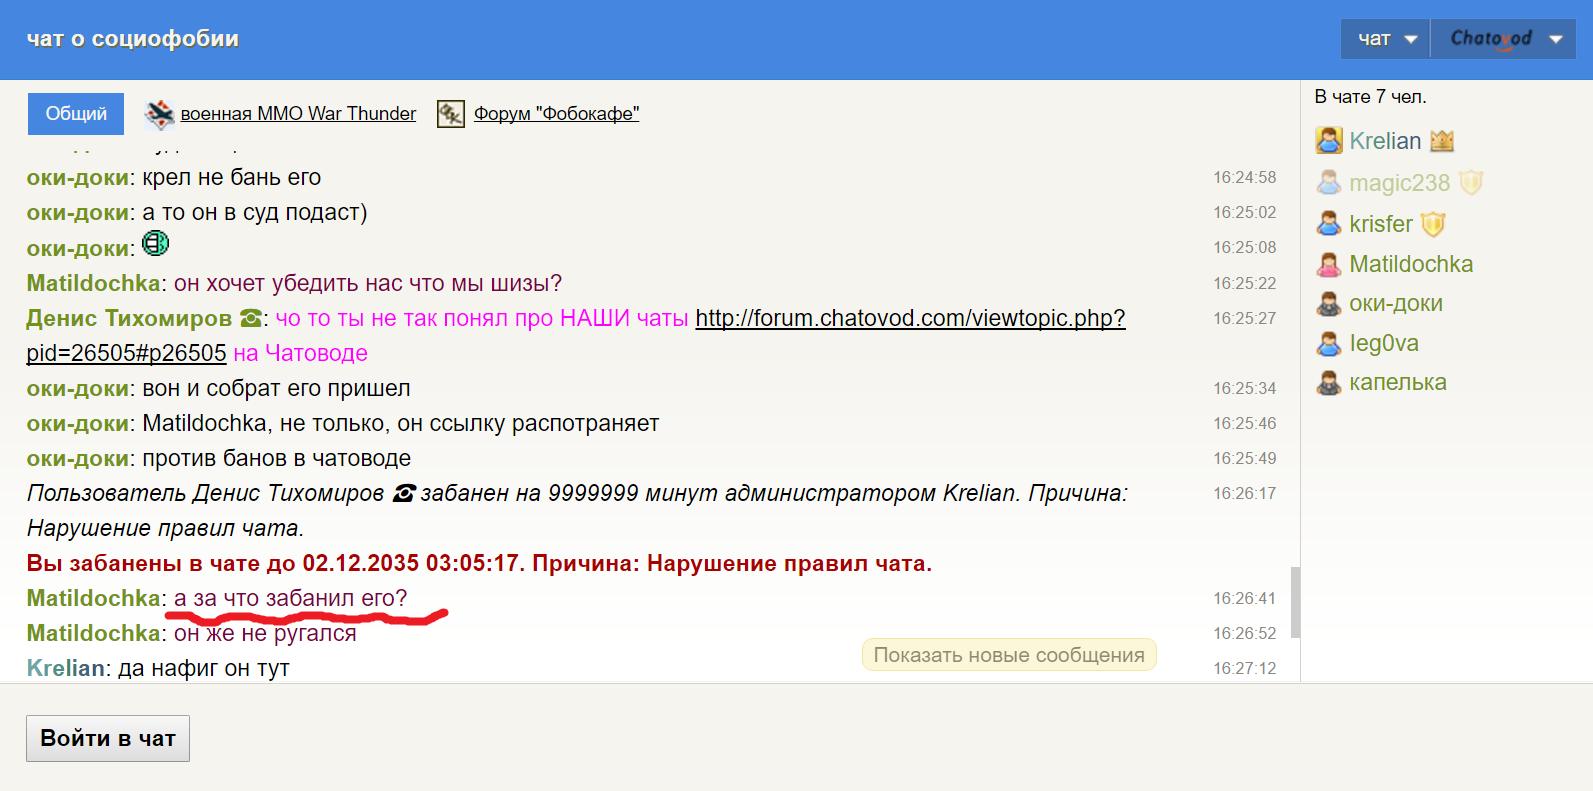 https://img-fotki.yandex.ru/get/199051/246246705.3/0_15fae0_99150b63_orig.png